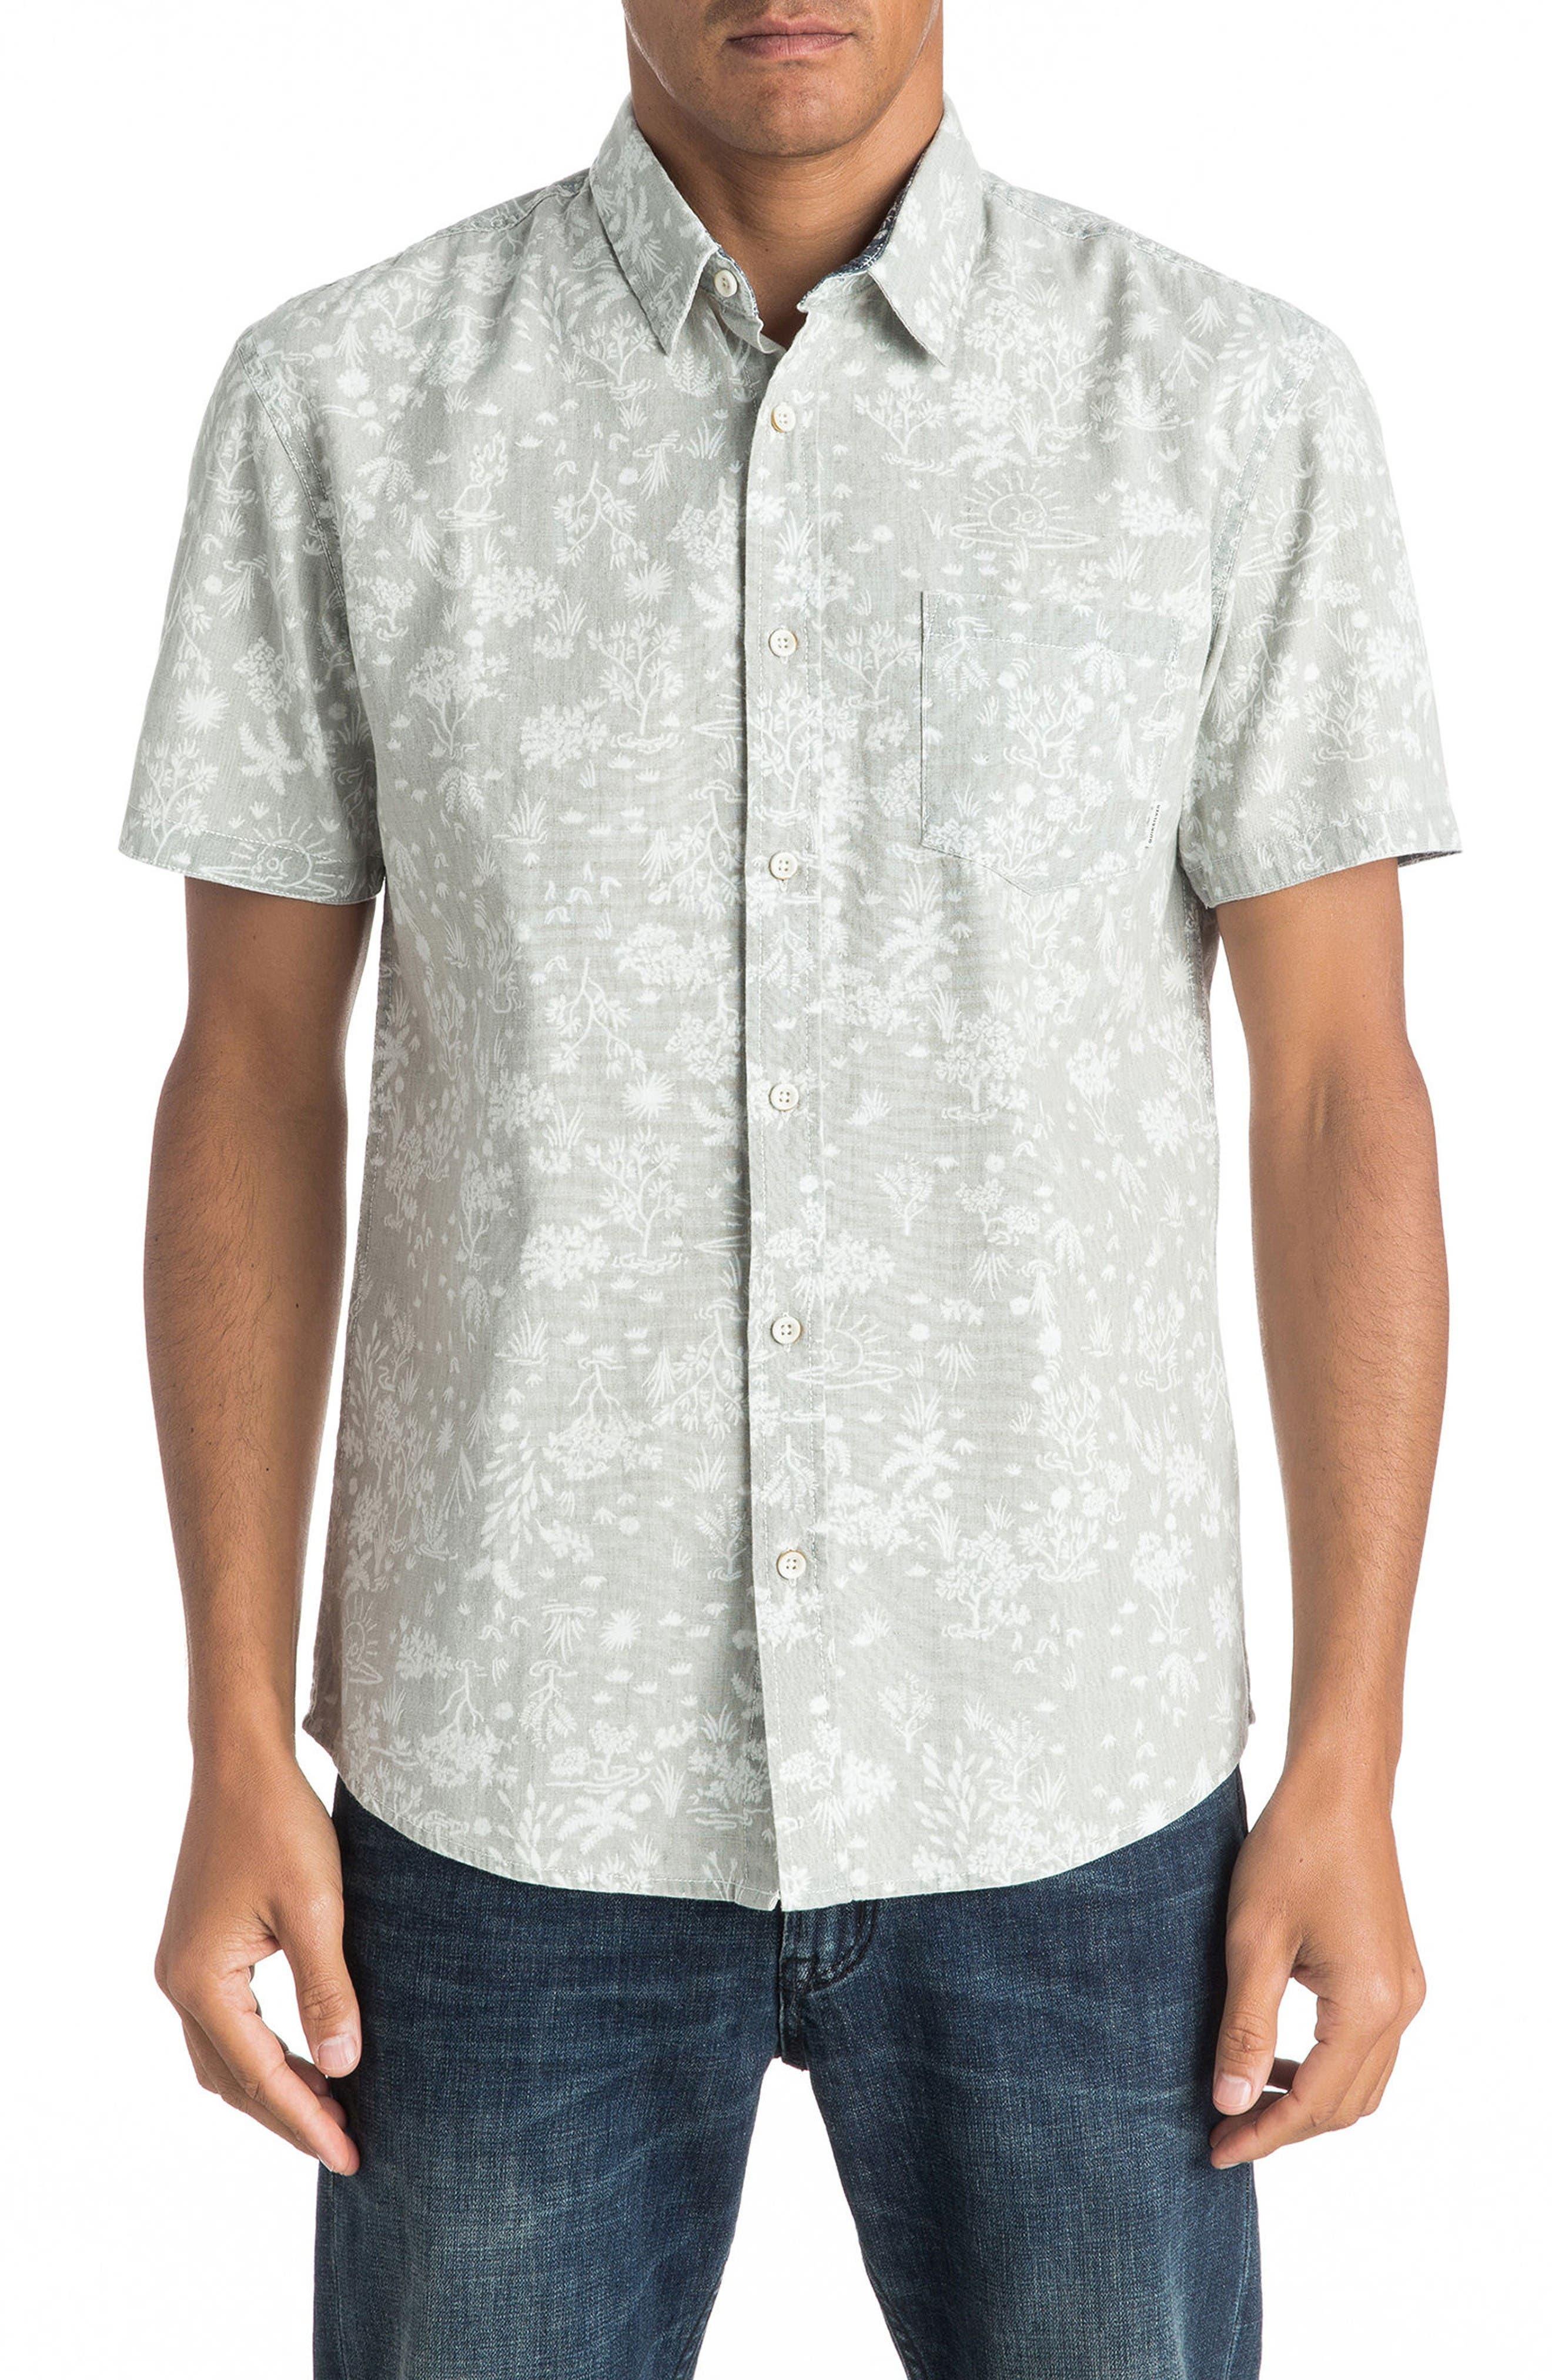 Main Image - Quiksilver Bloom Field Diver Woven Shirt